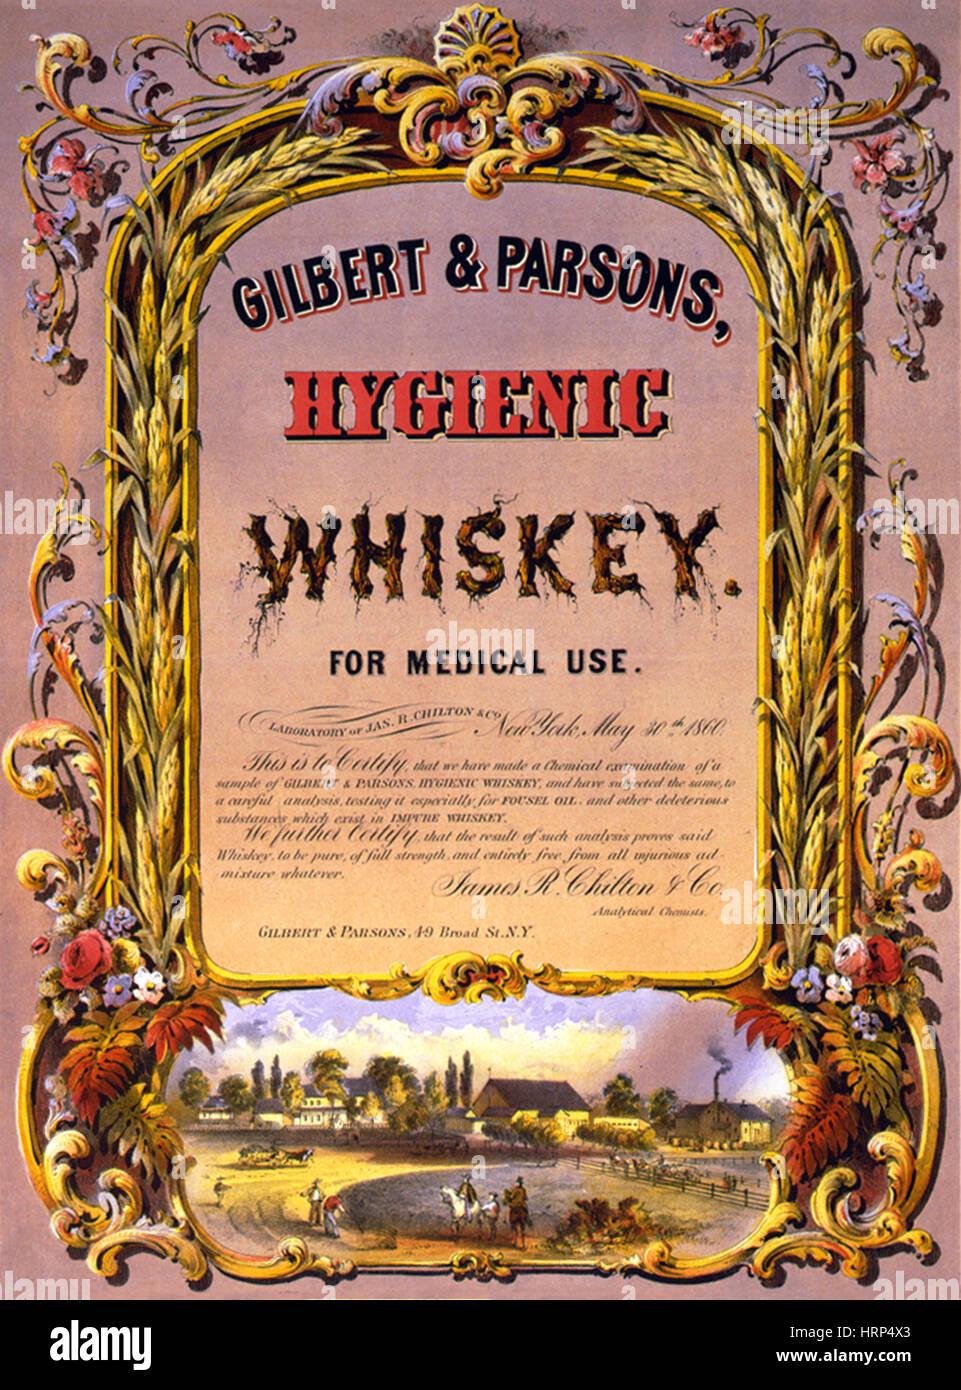 Hygienic Whiskey, Medicinal Alcohol, 1860s - Stock Image